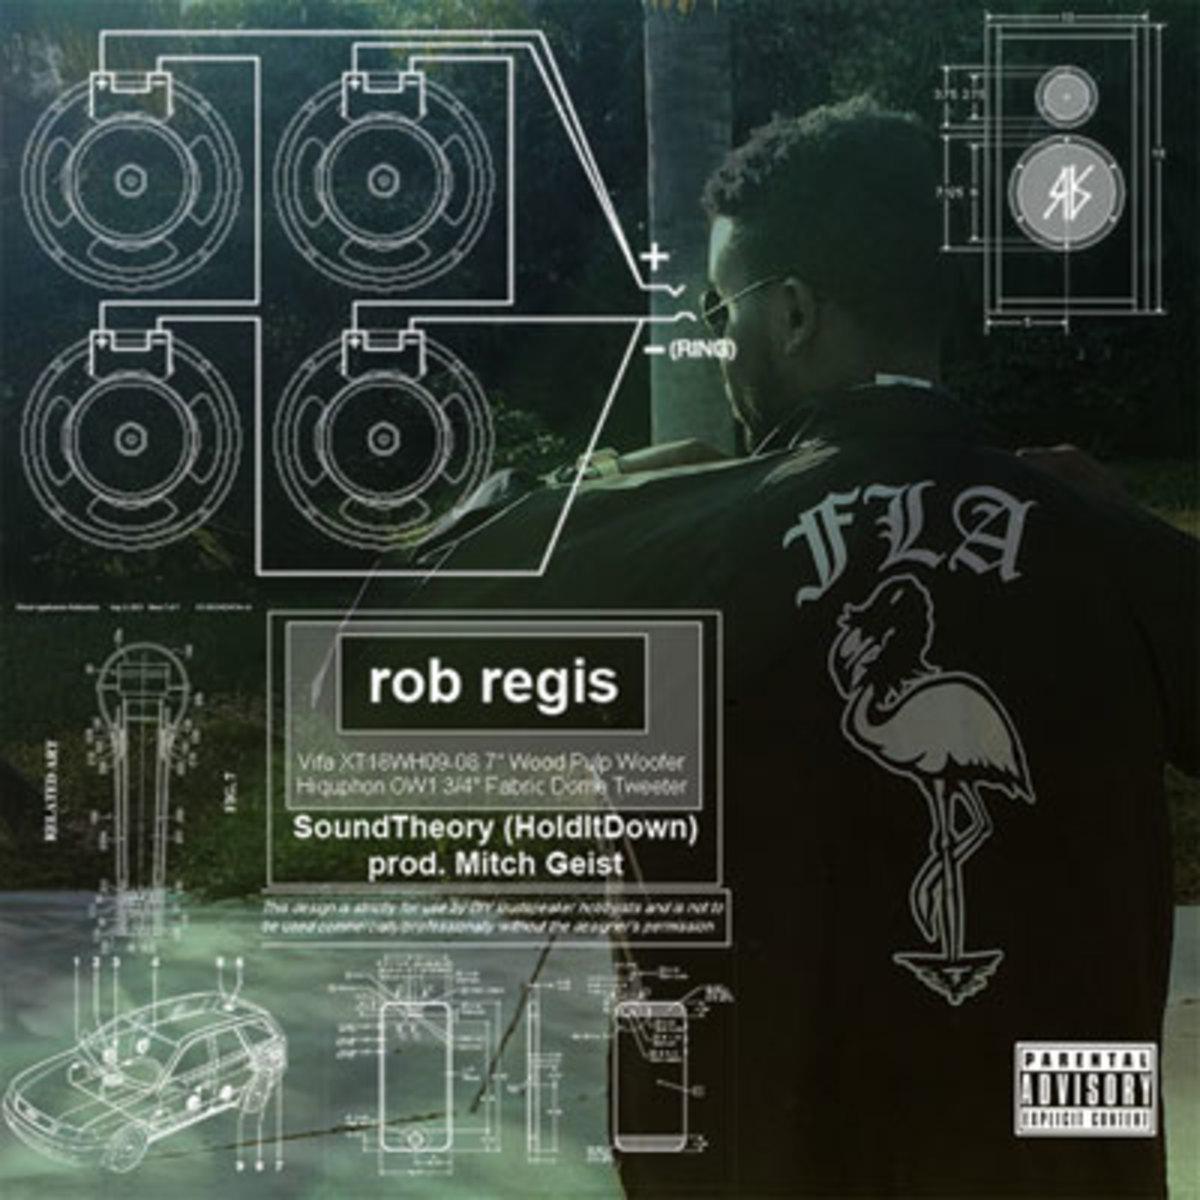 robregis-soundtheory.jpg